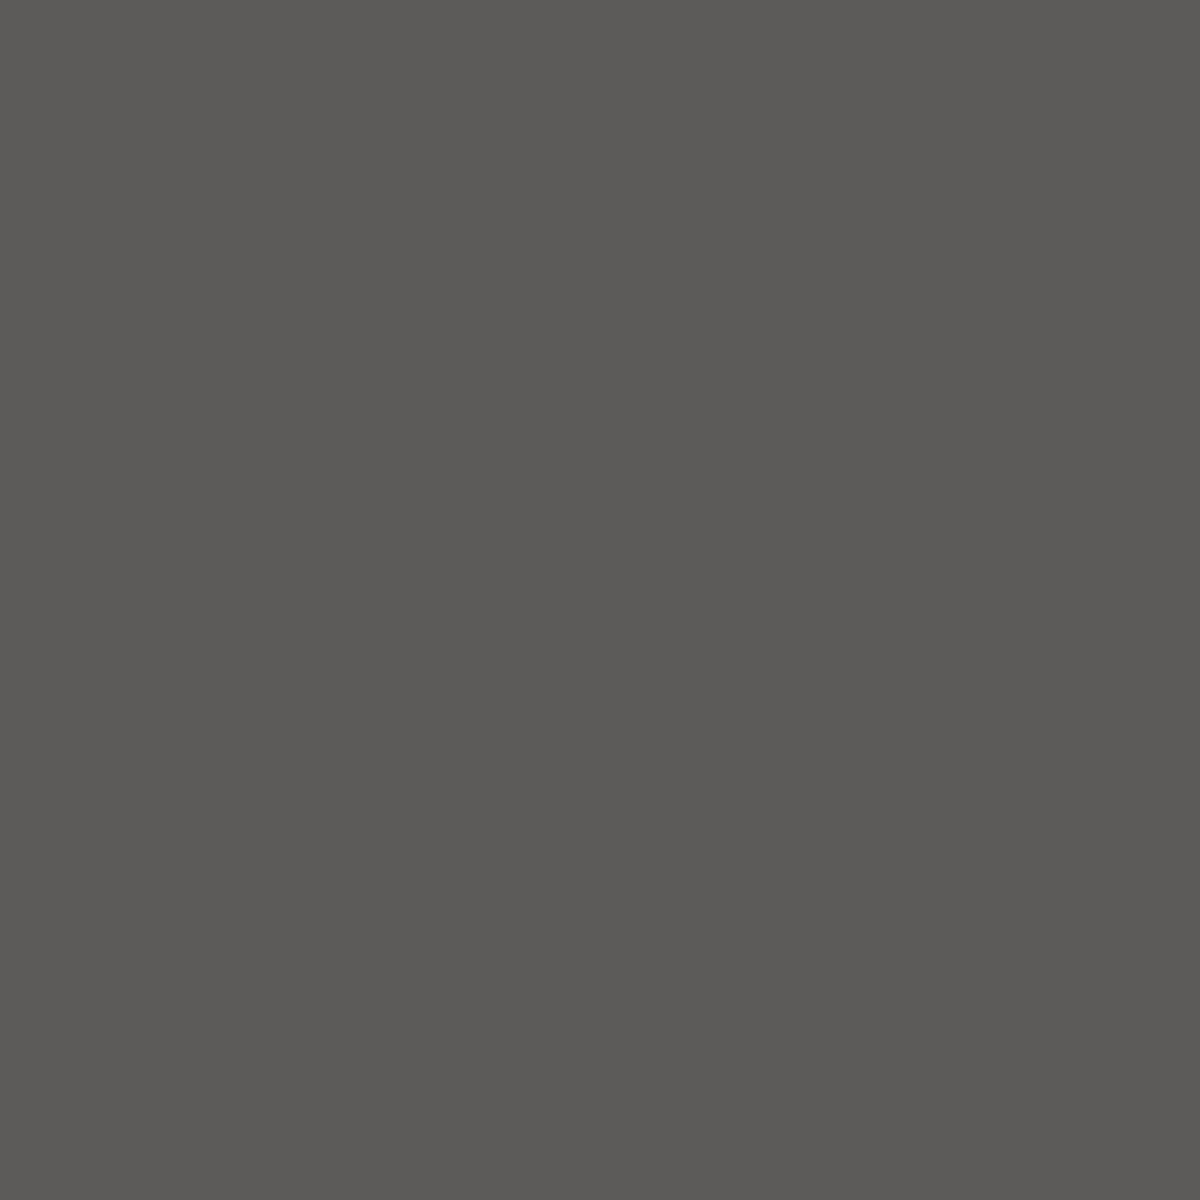 Organicline (10 ml) - PIGMENTS AMIEA ORGANICLINE GRAPHITE, Flacon 10 ml